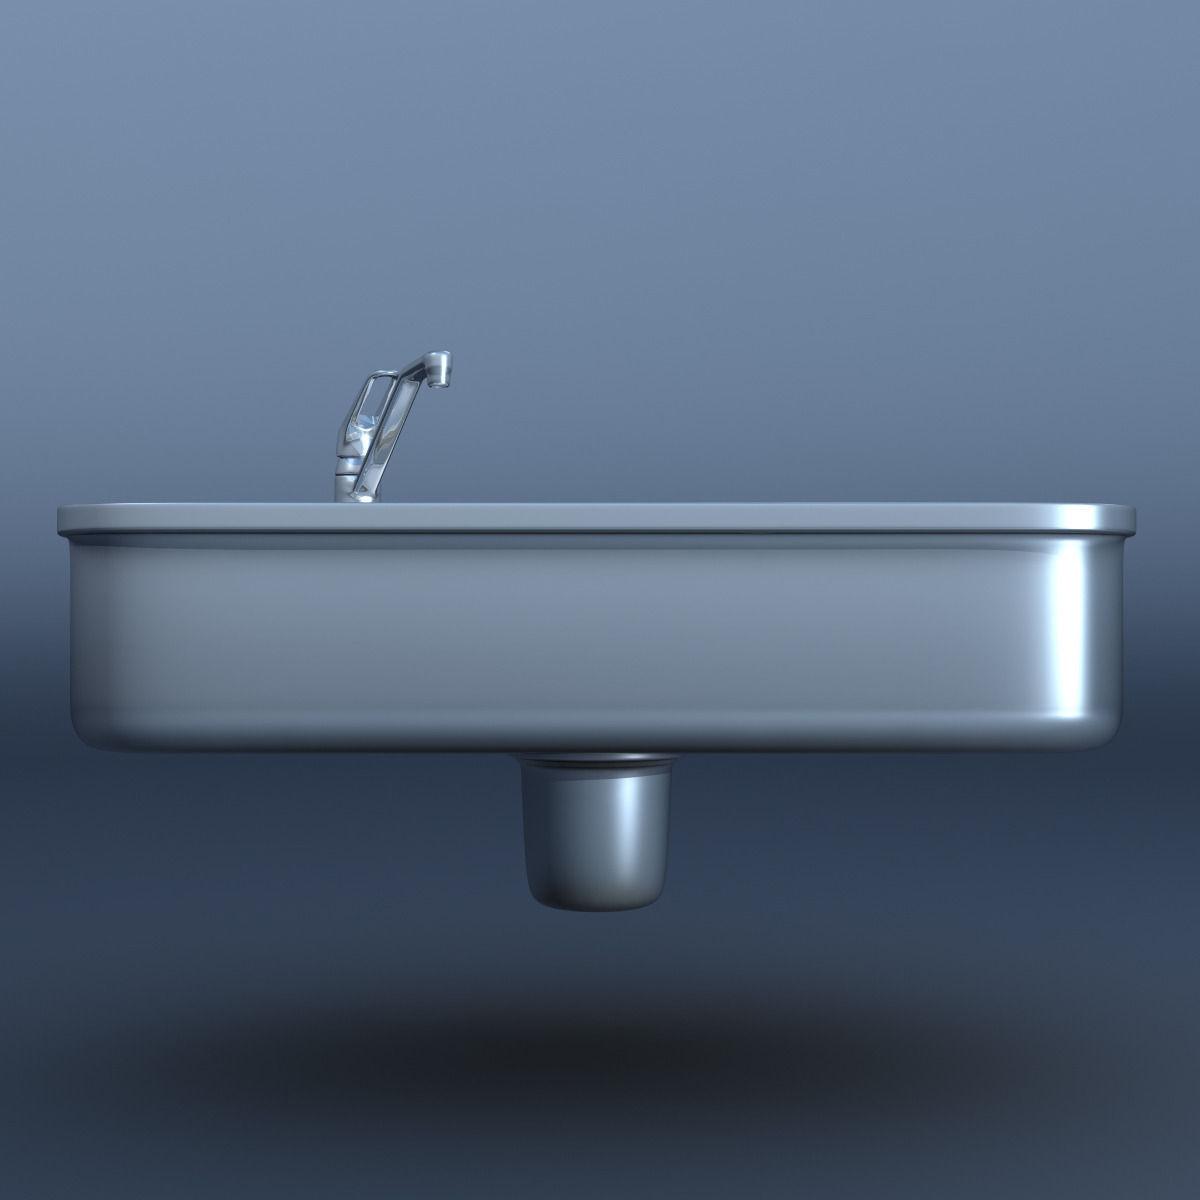 Kitchen Sink Model: Kitchen Sink 3D Model .max .obj .fbx .c4d .lwo .lw .lws